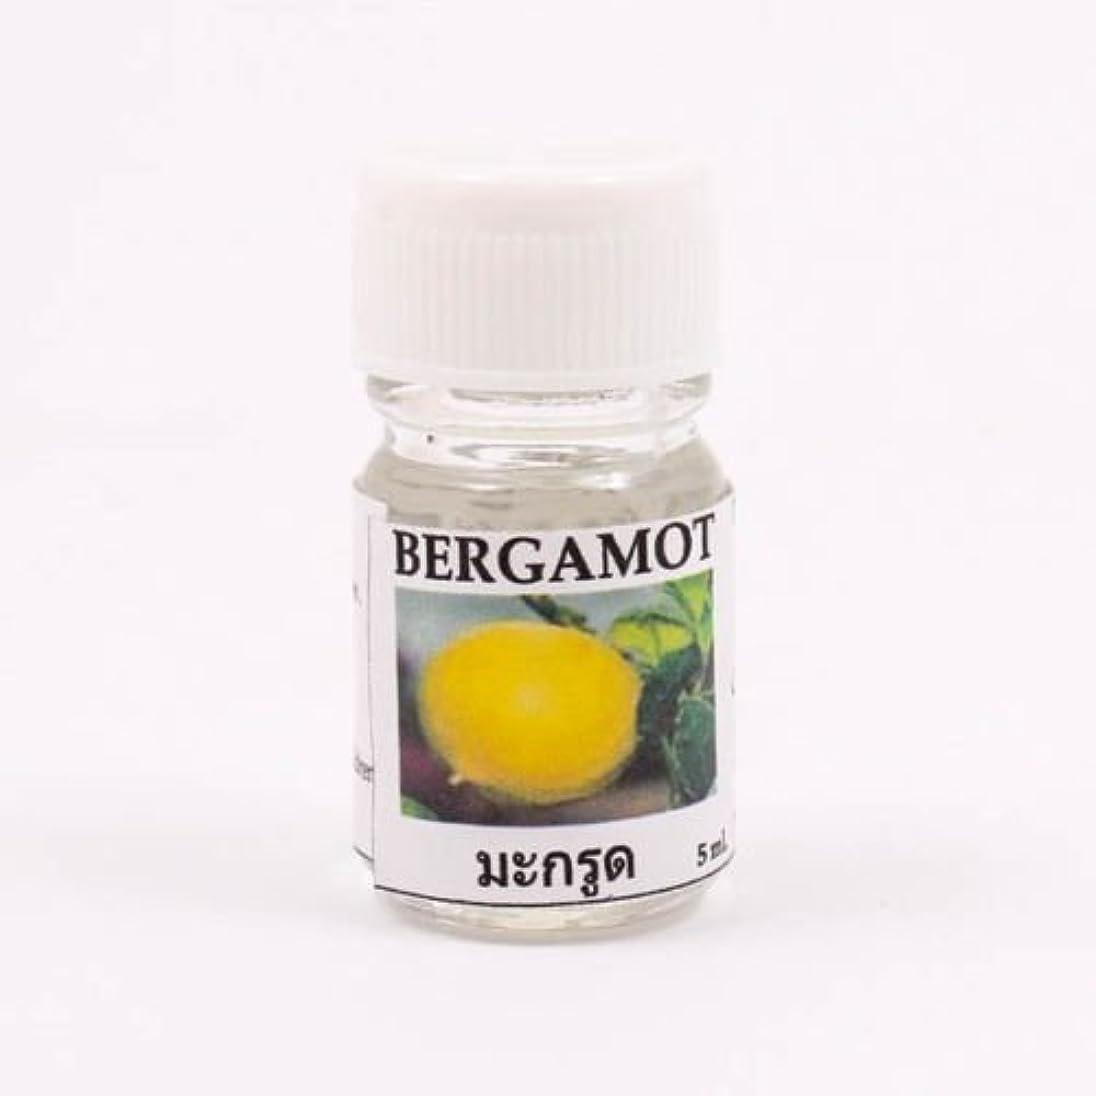 6X Bergamot Aroma Fragrance Essential Oil 5ML (cc) Diffuser Burner Therapy